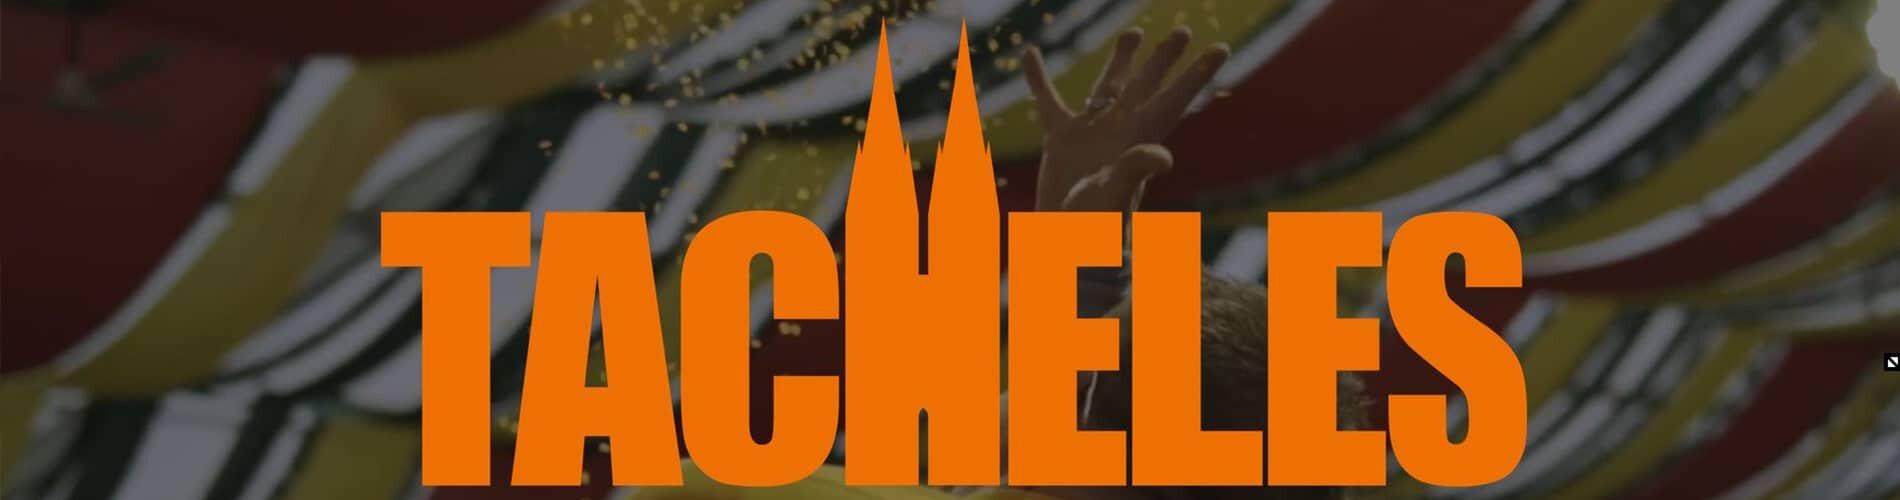 Referenz Tacheles